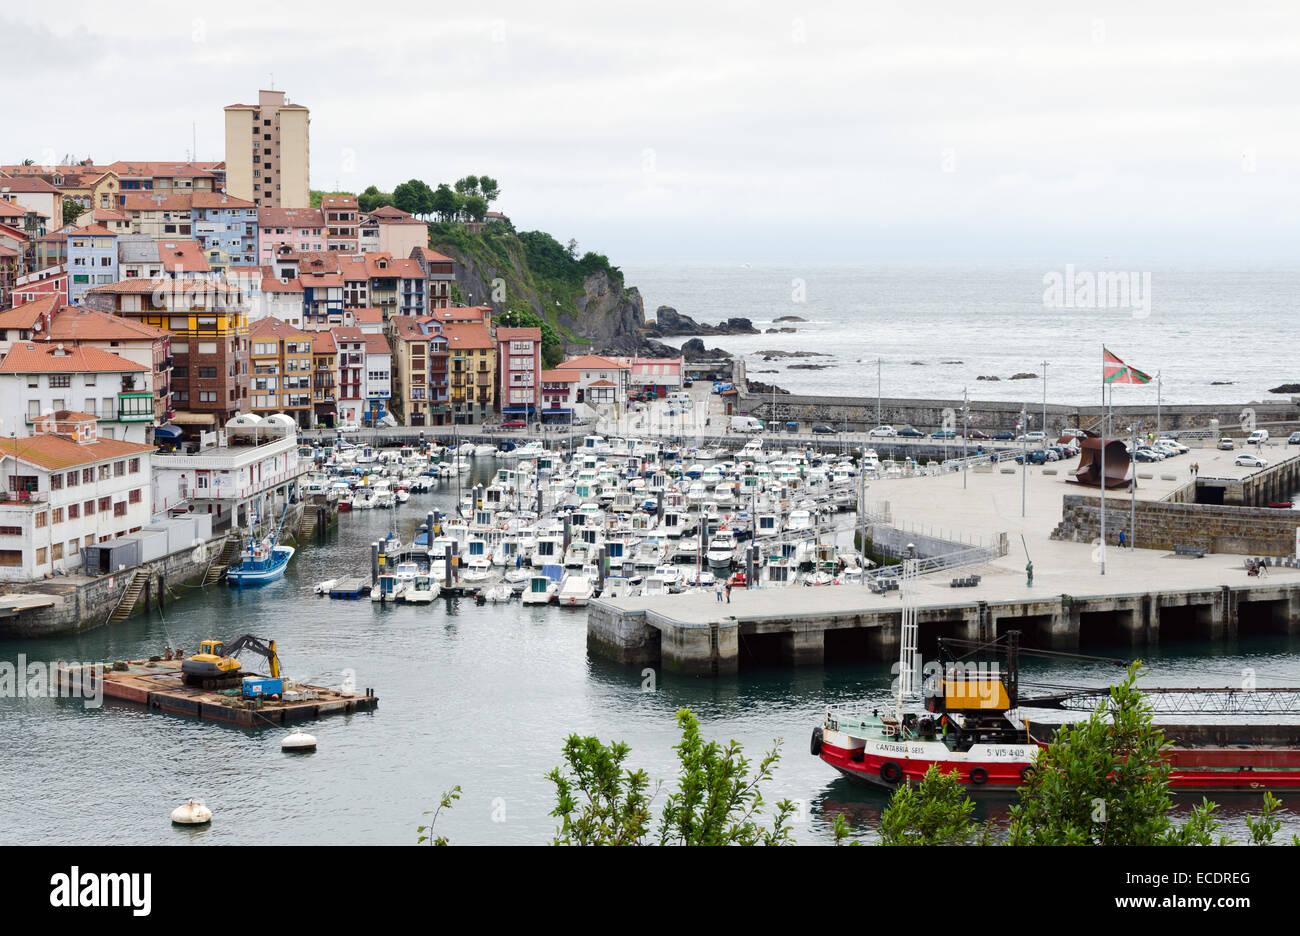 bermeo spain july 3 the modern port of bermeo one of the most rh alamy com